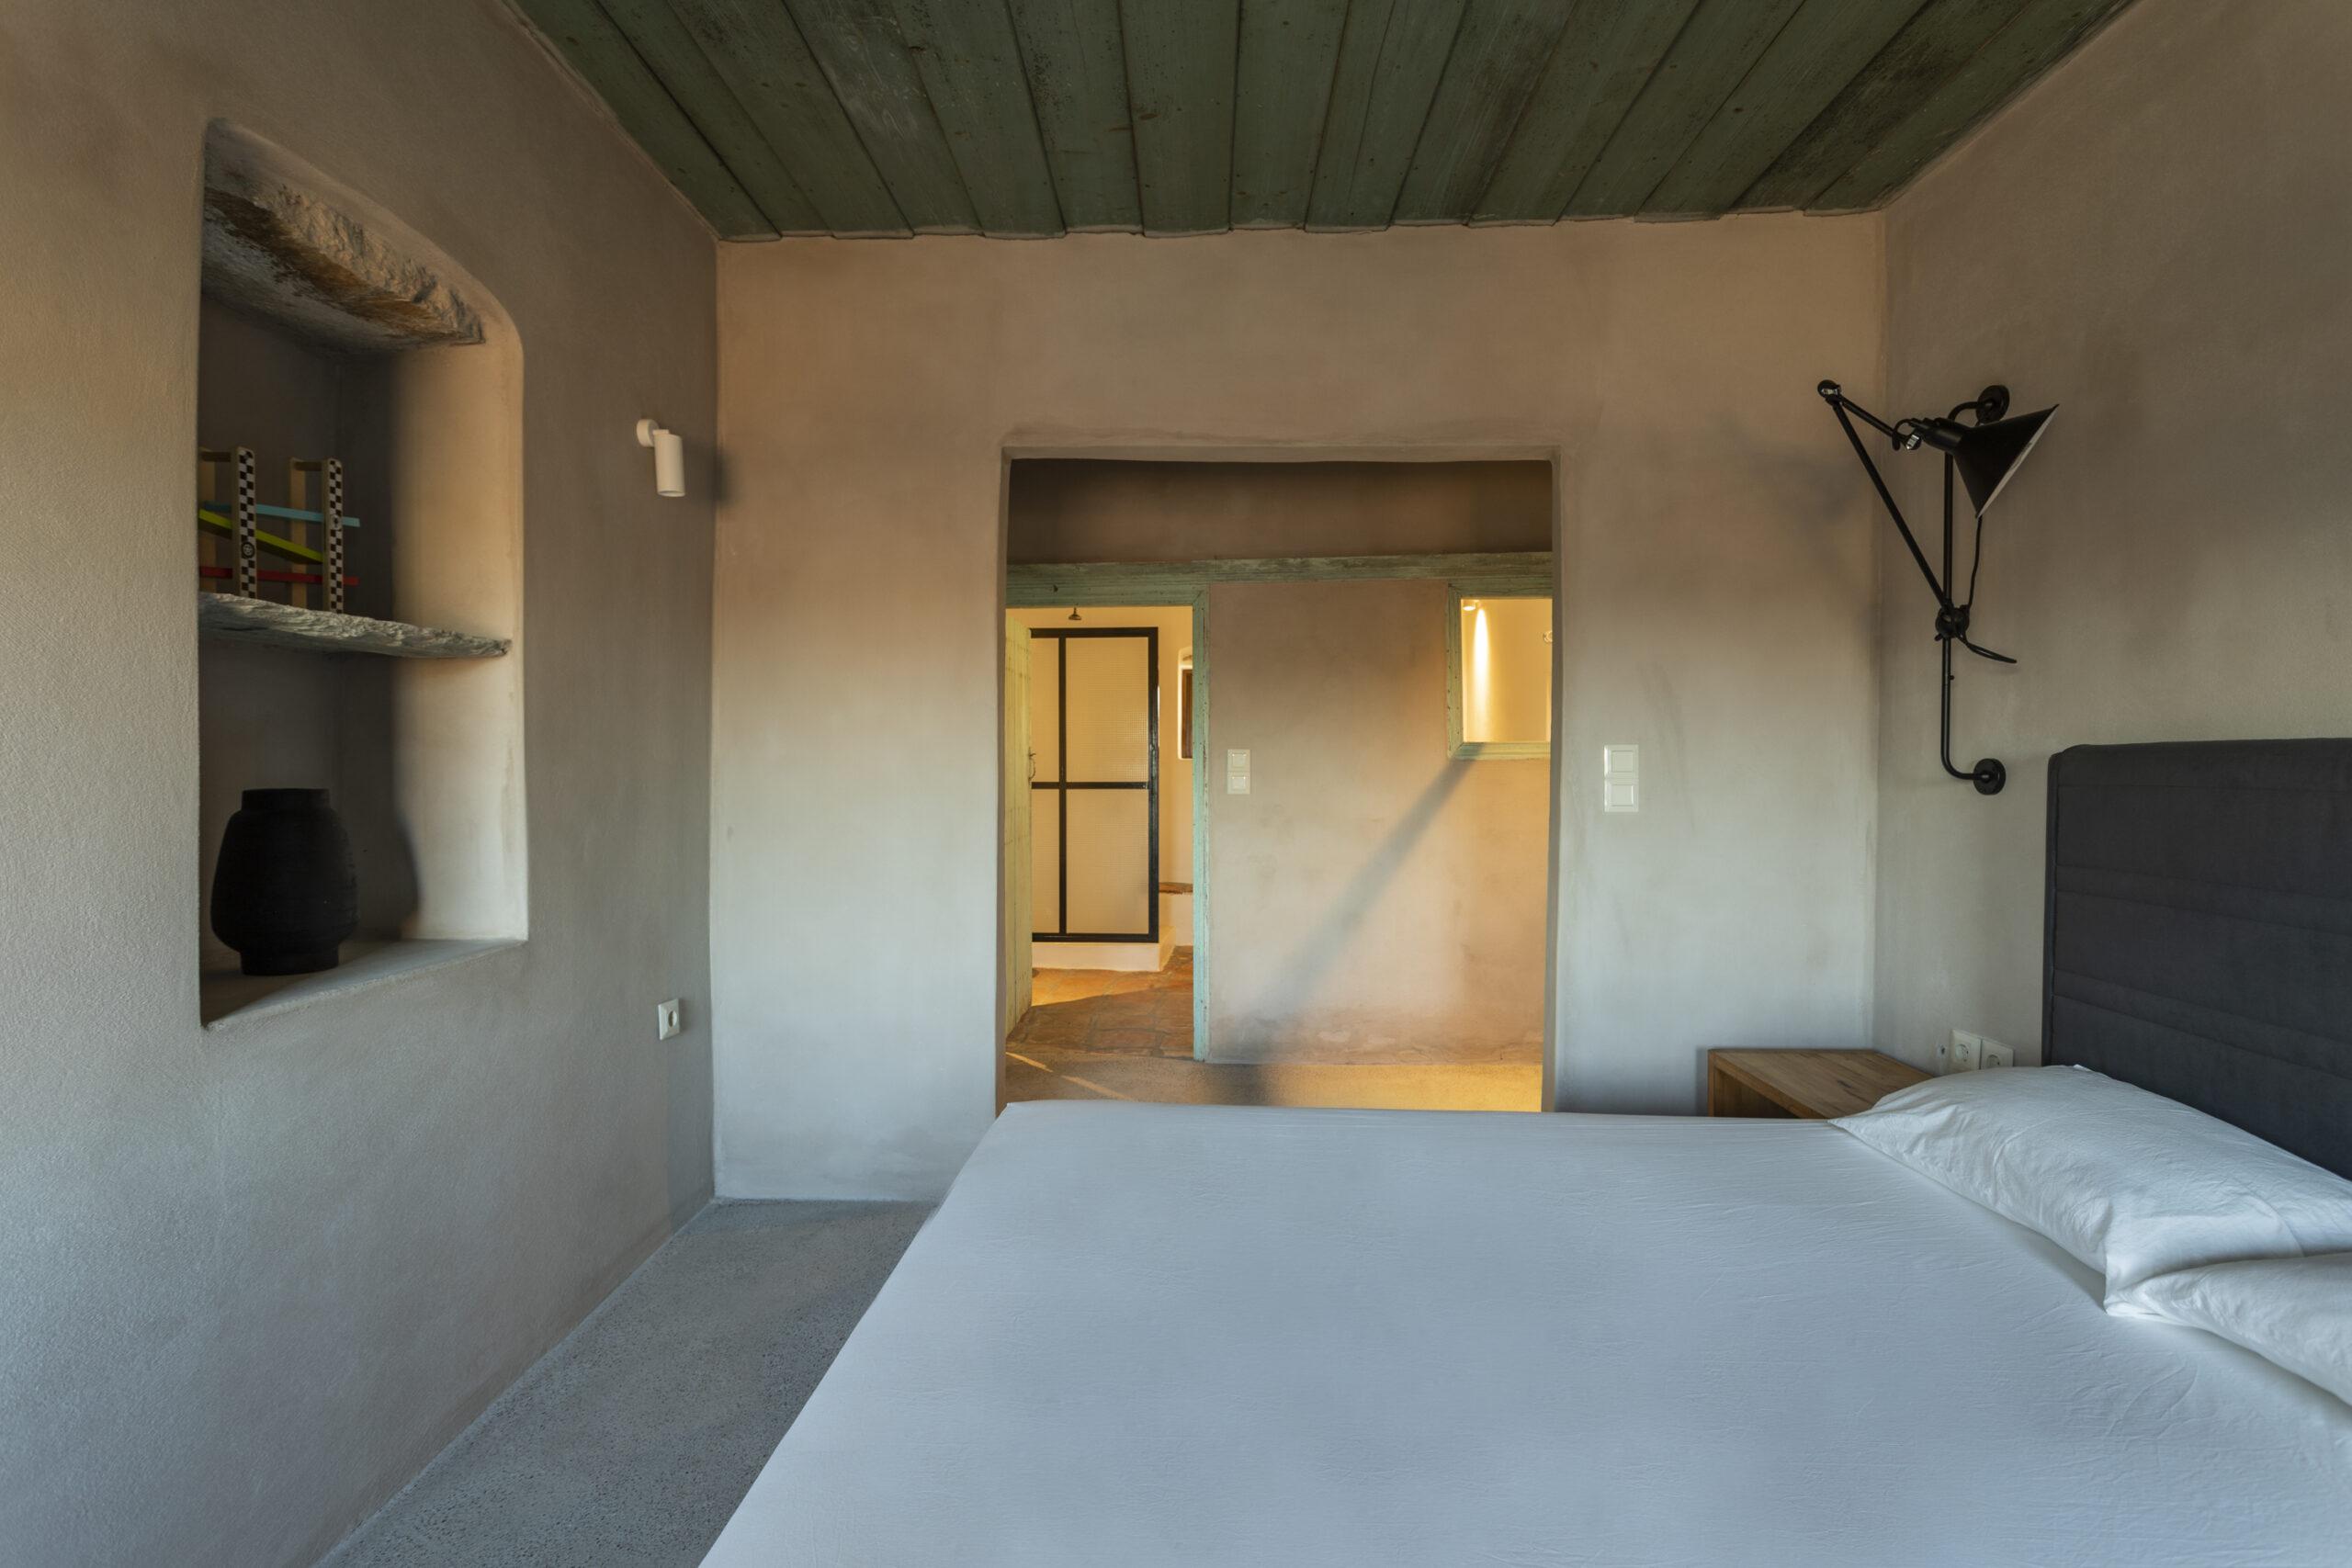 Kythira  - Maison  - picture 4